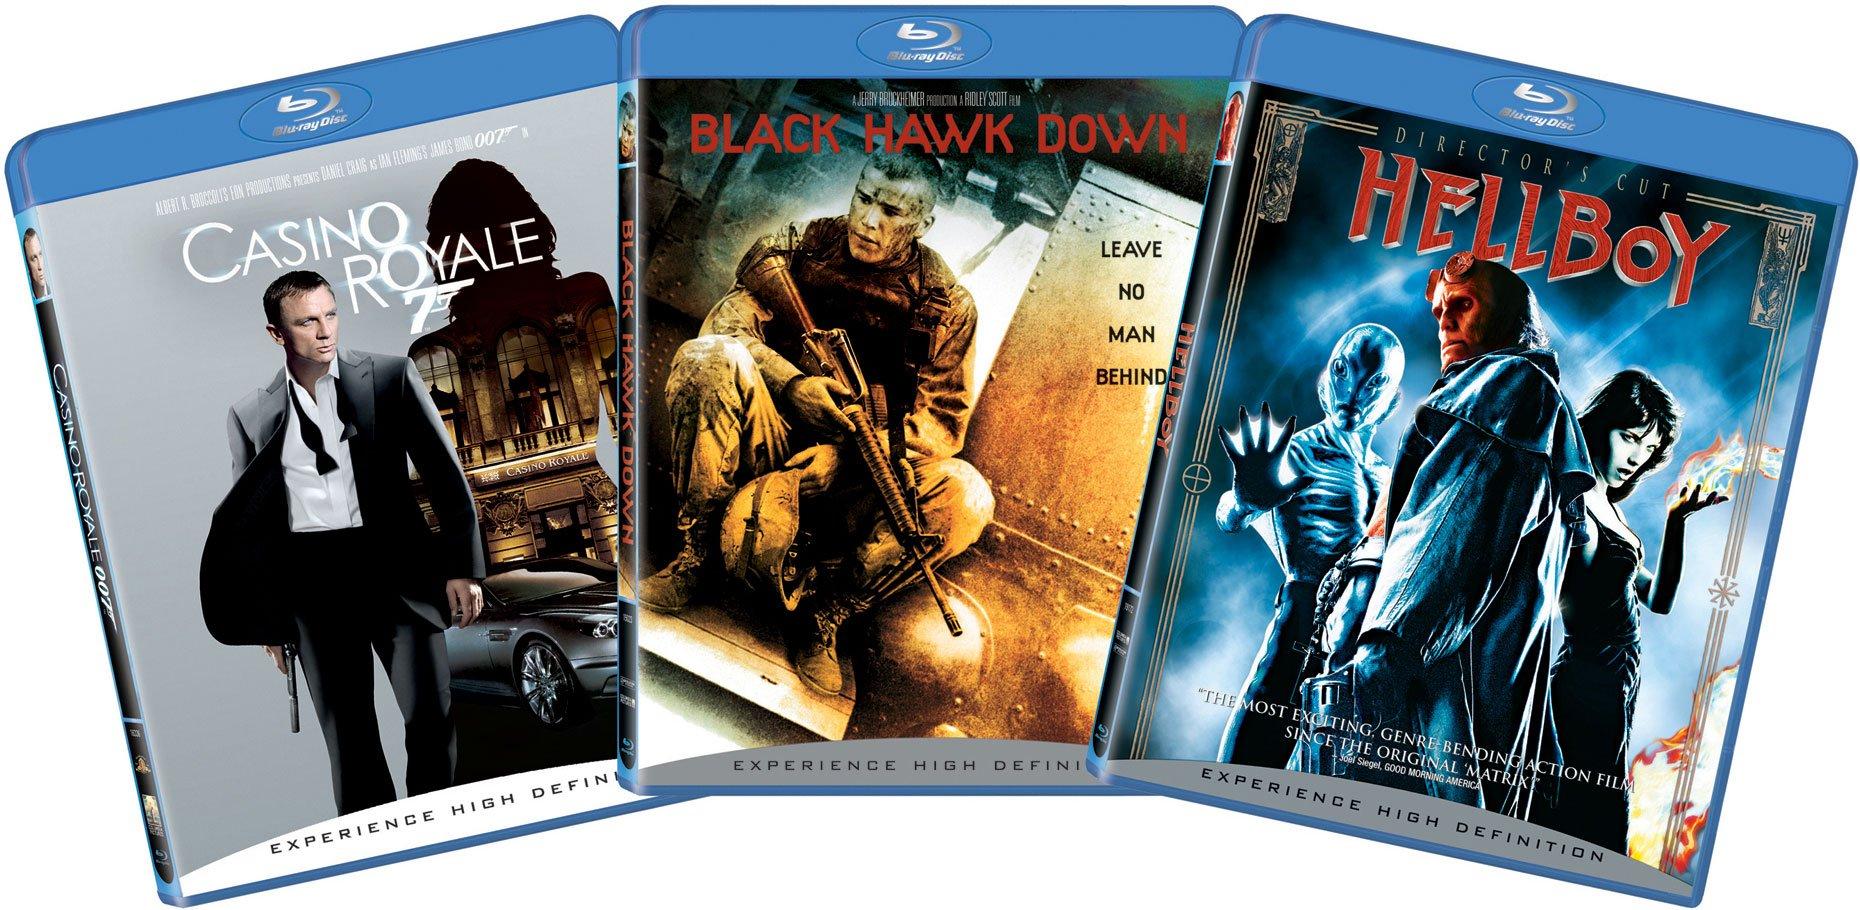 Blu-ray Action 3-pk Bundle (Casino Royale, Black Hawk Down, Hellboy)